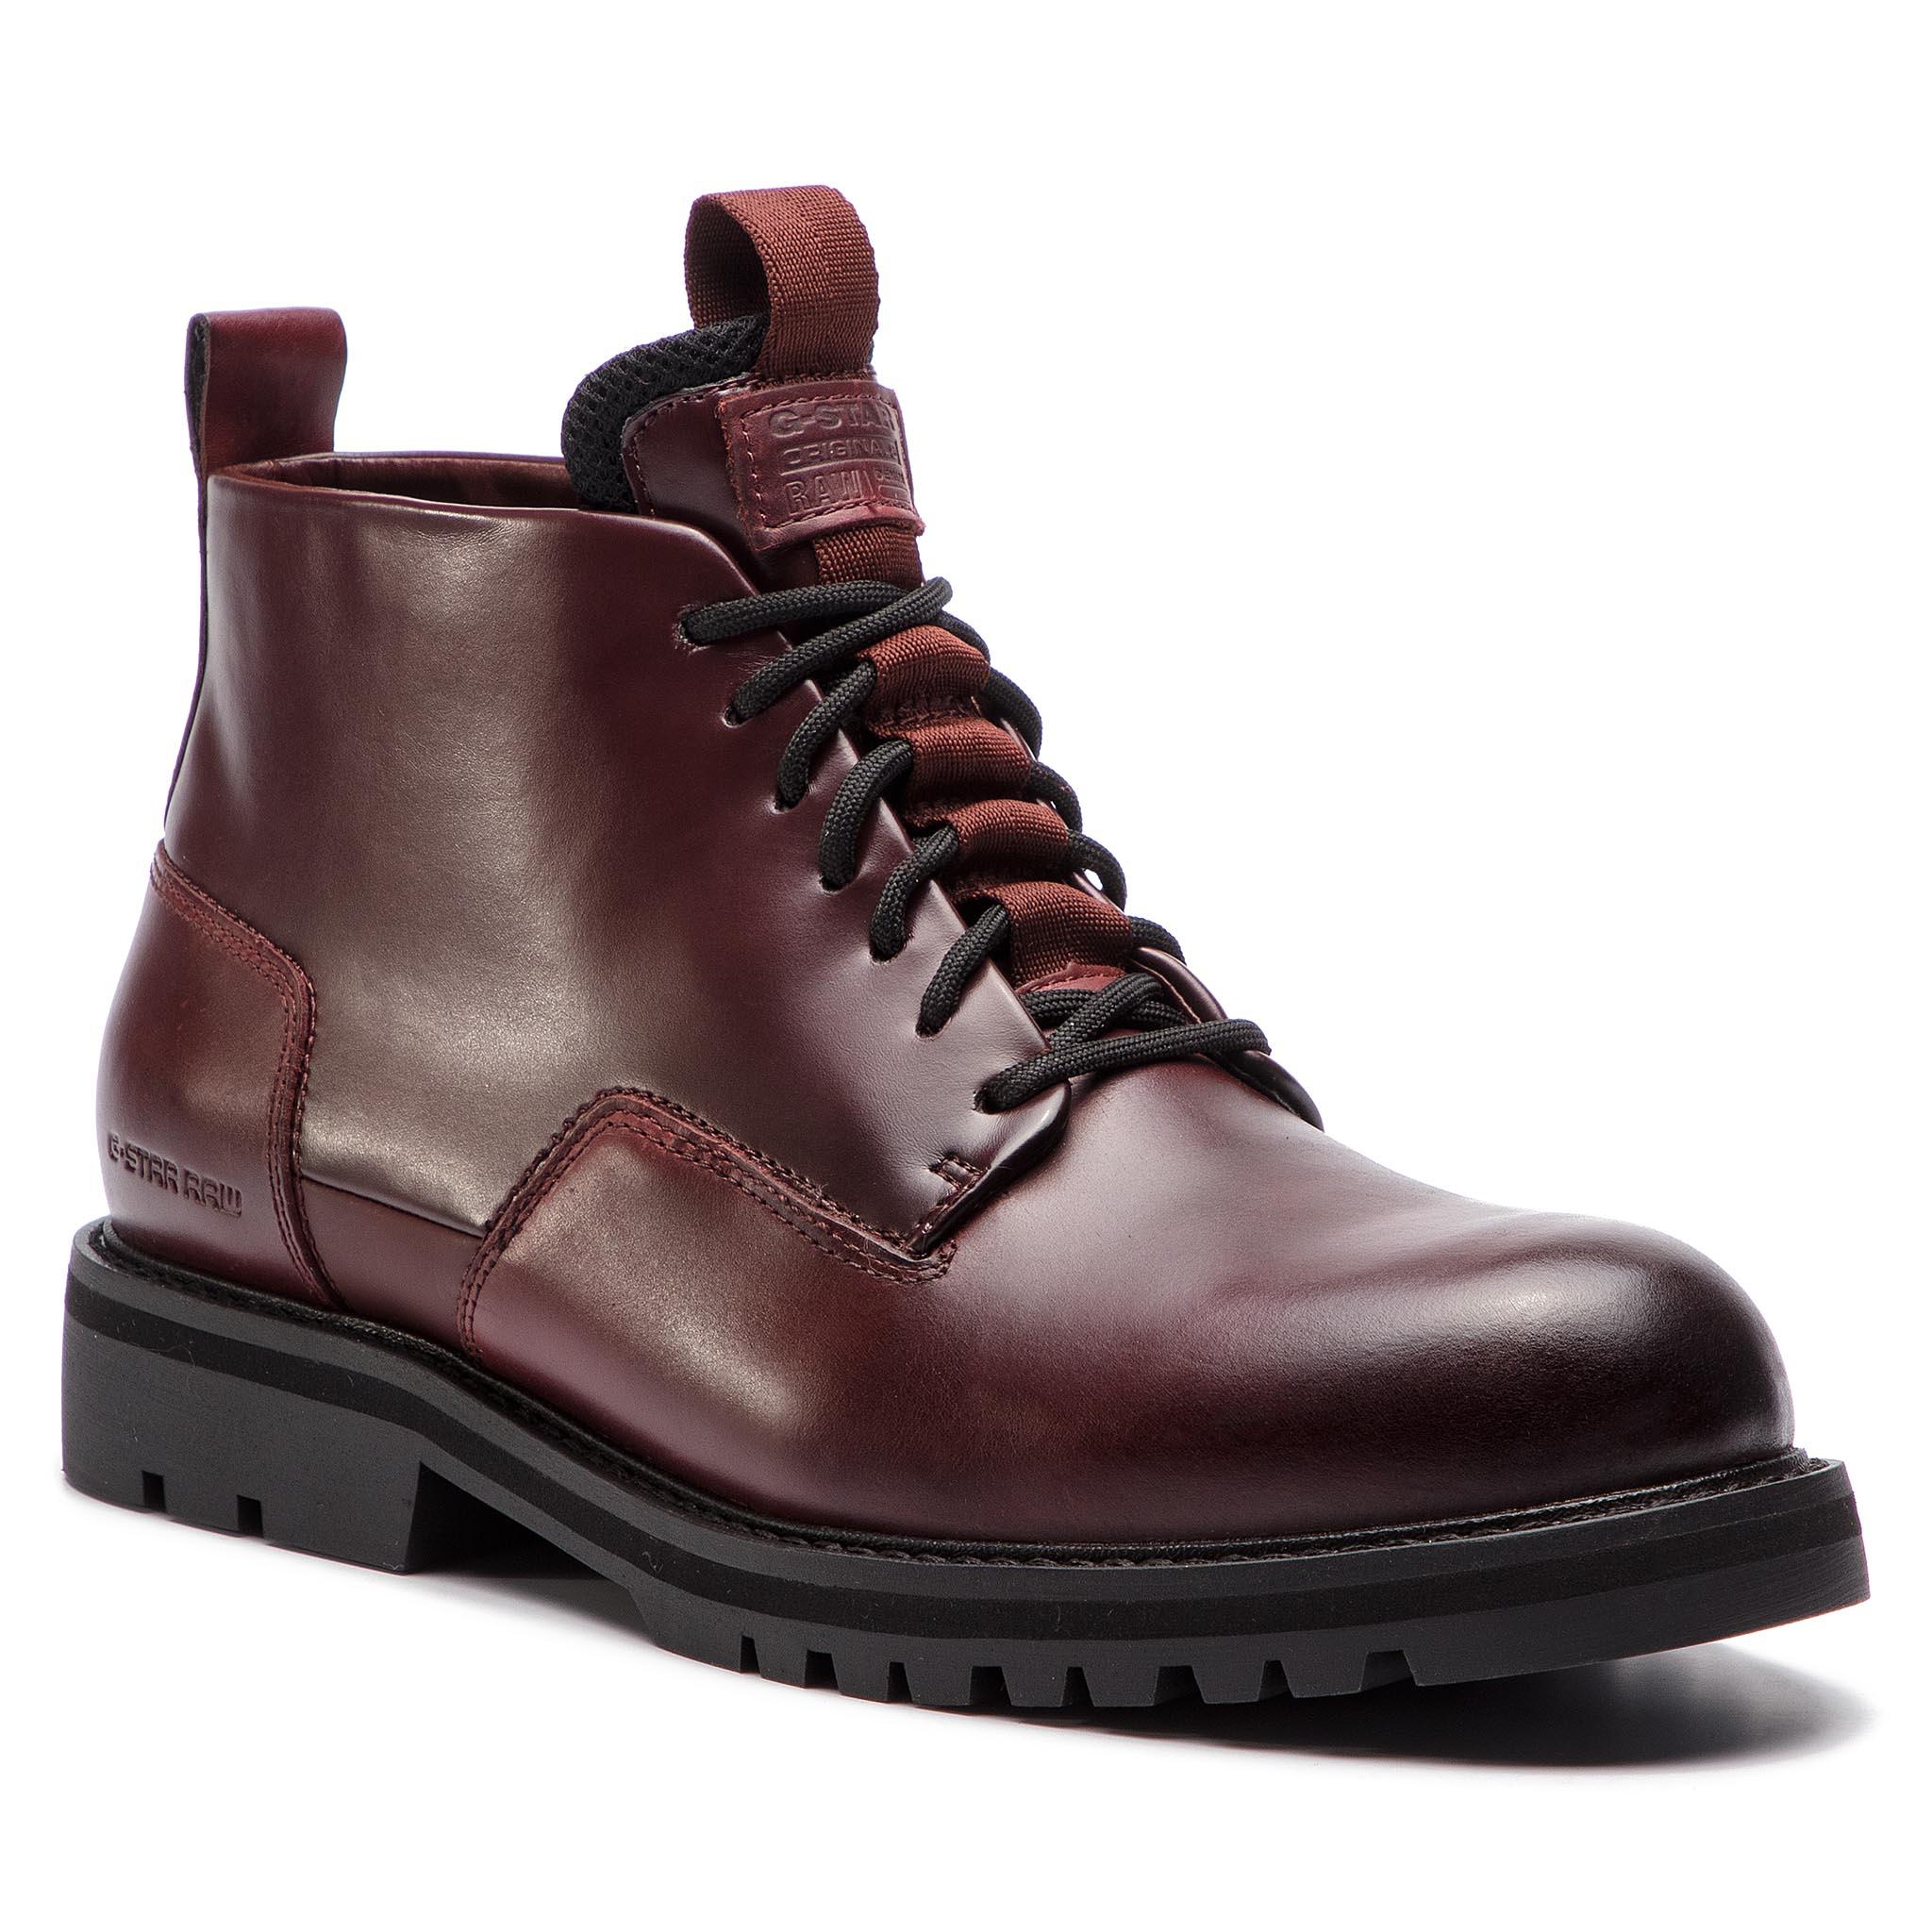 caf45ac4f3e136 Knee High Boots PANAMA JACK - Glasgow Gtx GORE-TEX C3 Napa Gras ...